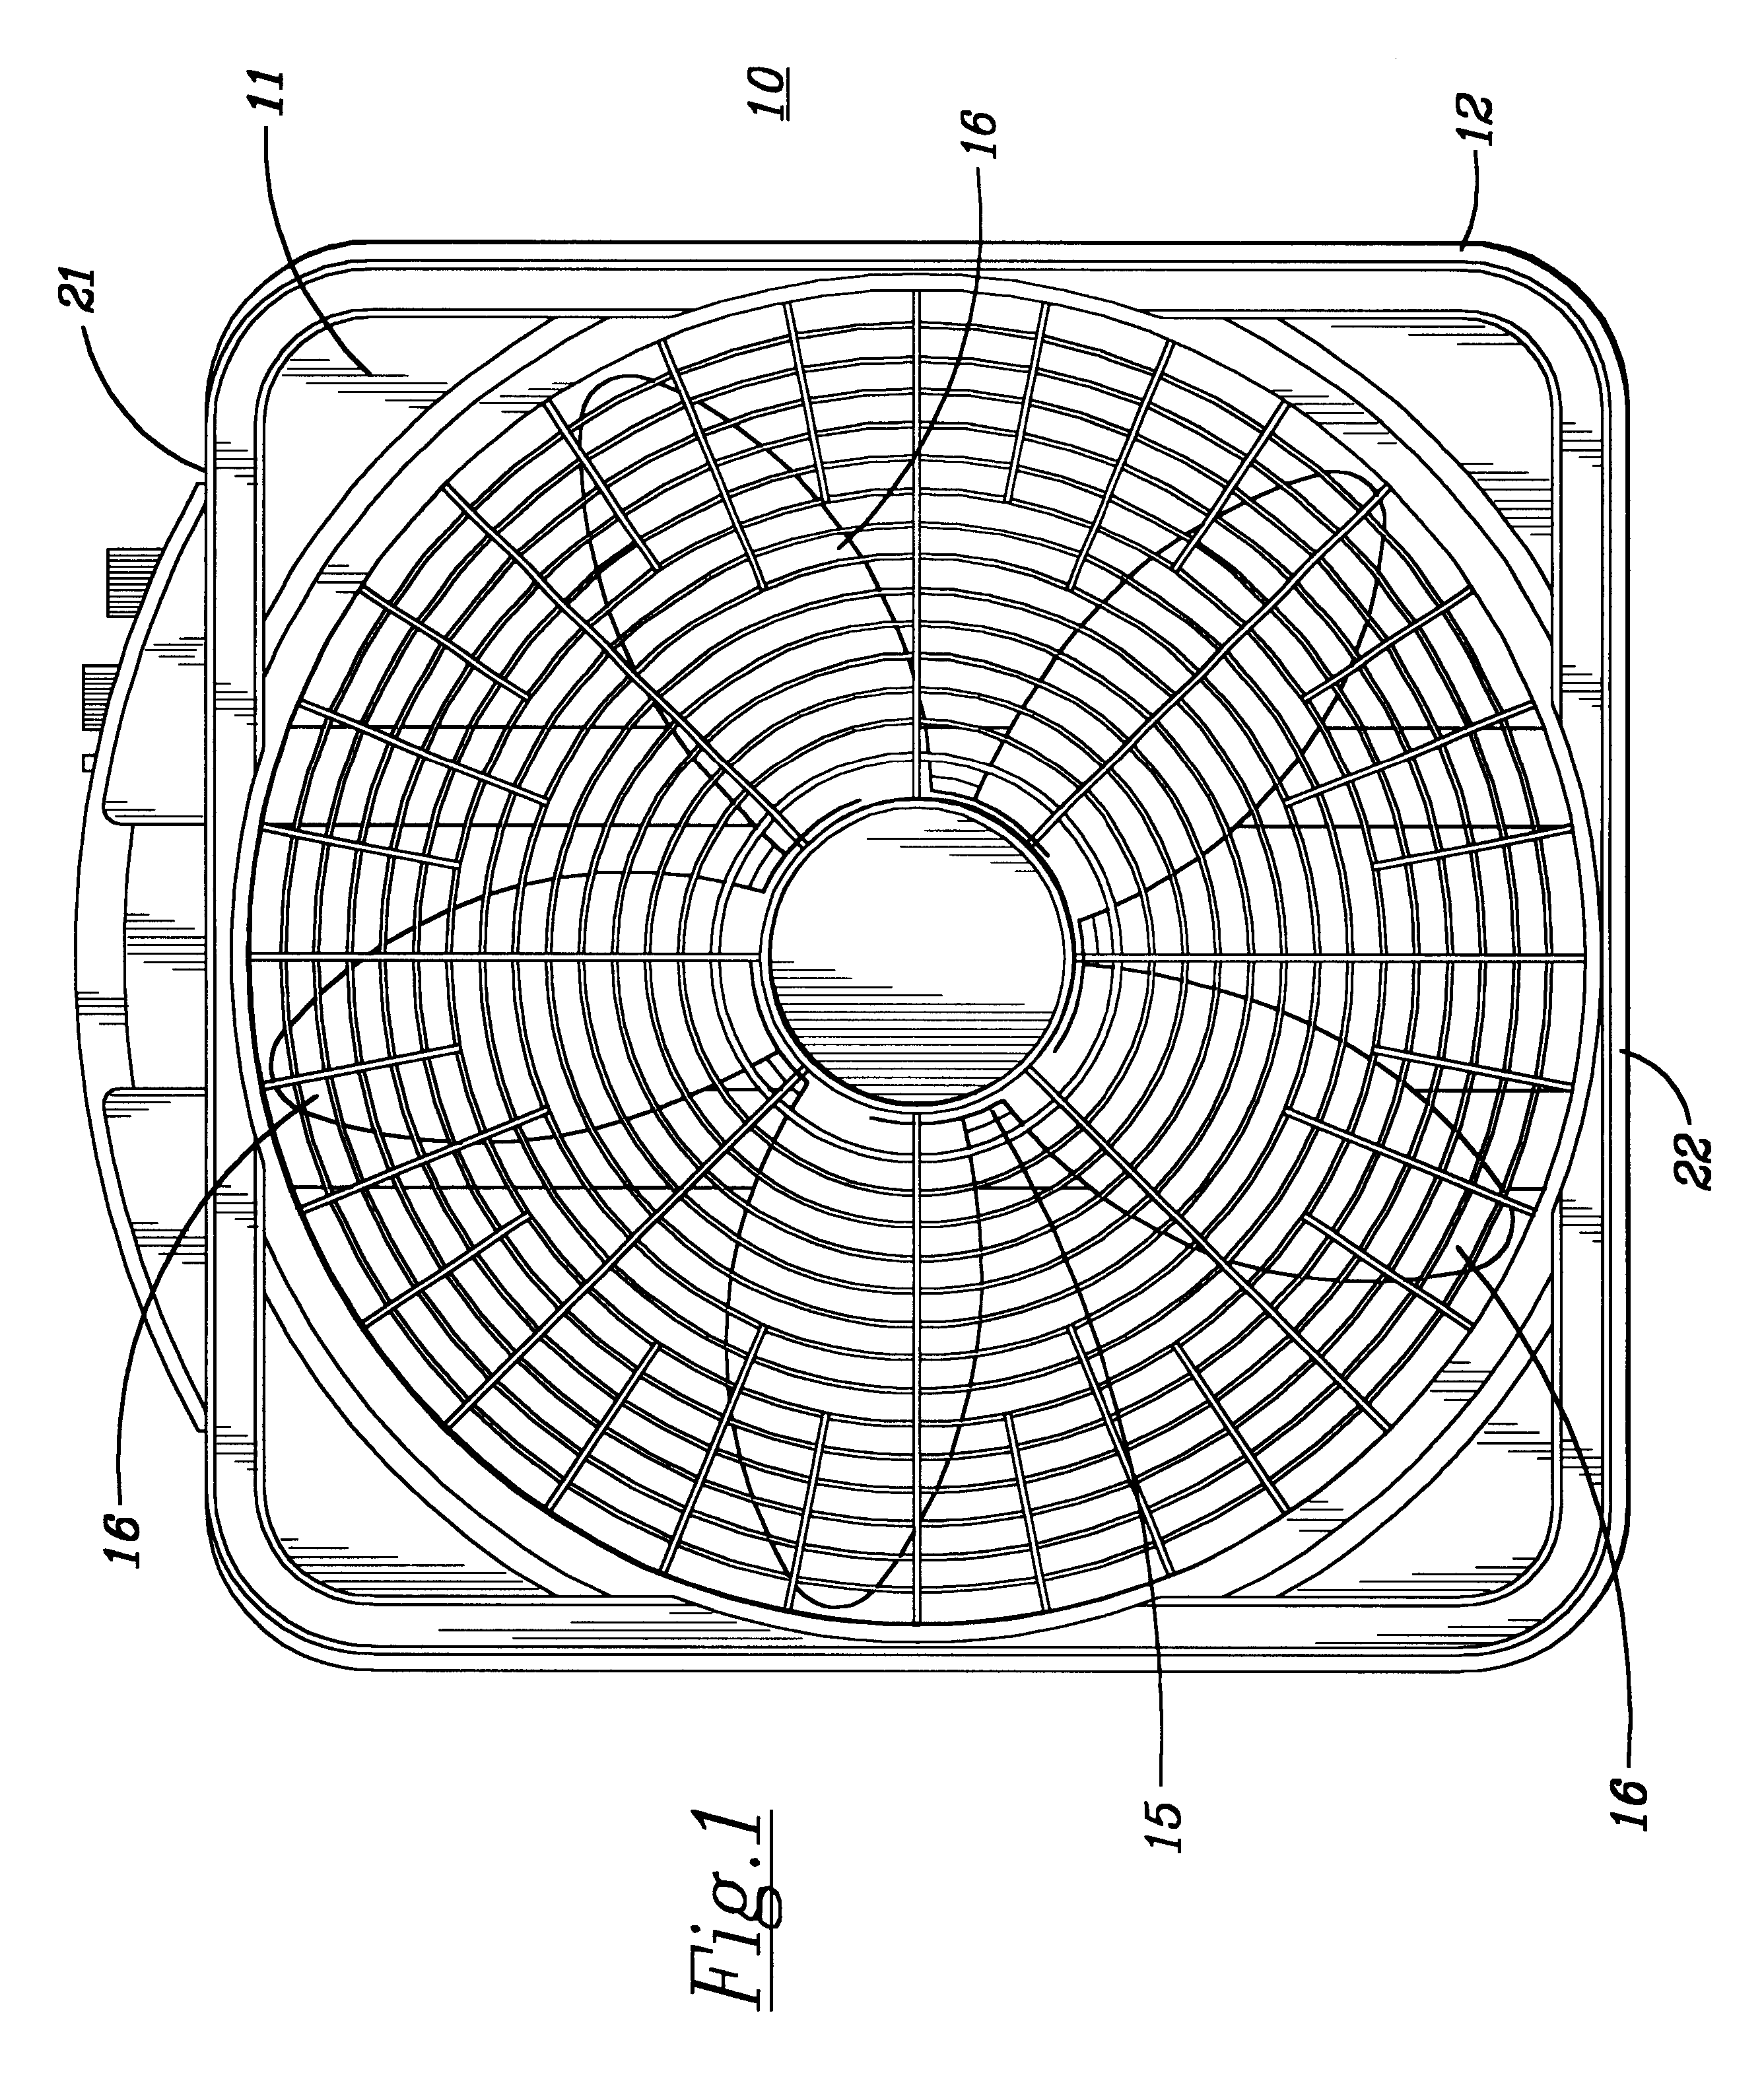 Box Fan Diagram Explained Wiring Diagrams Lasko Fuse Us06309192 20011030 D00001 26723152 Lace Teneriffe Cardboard